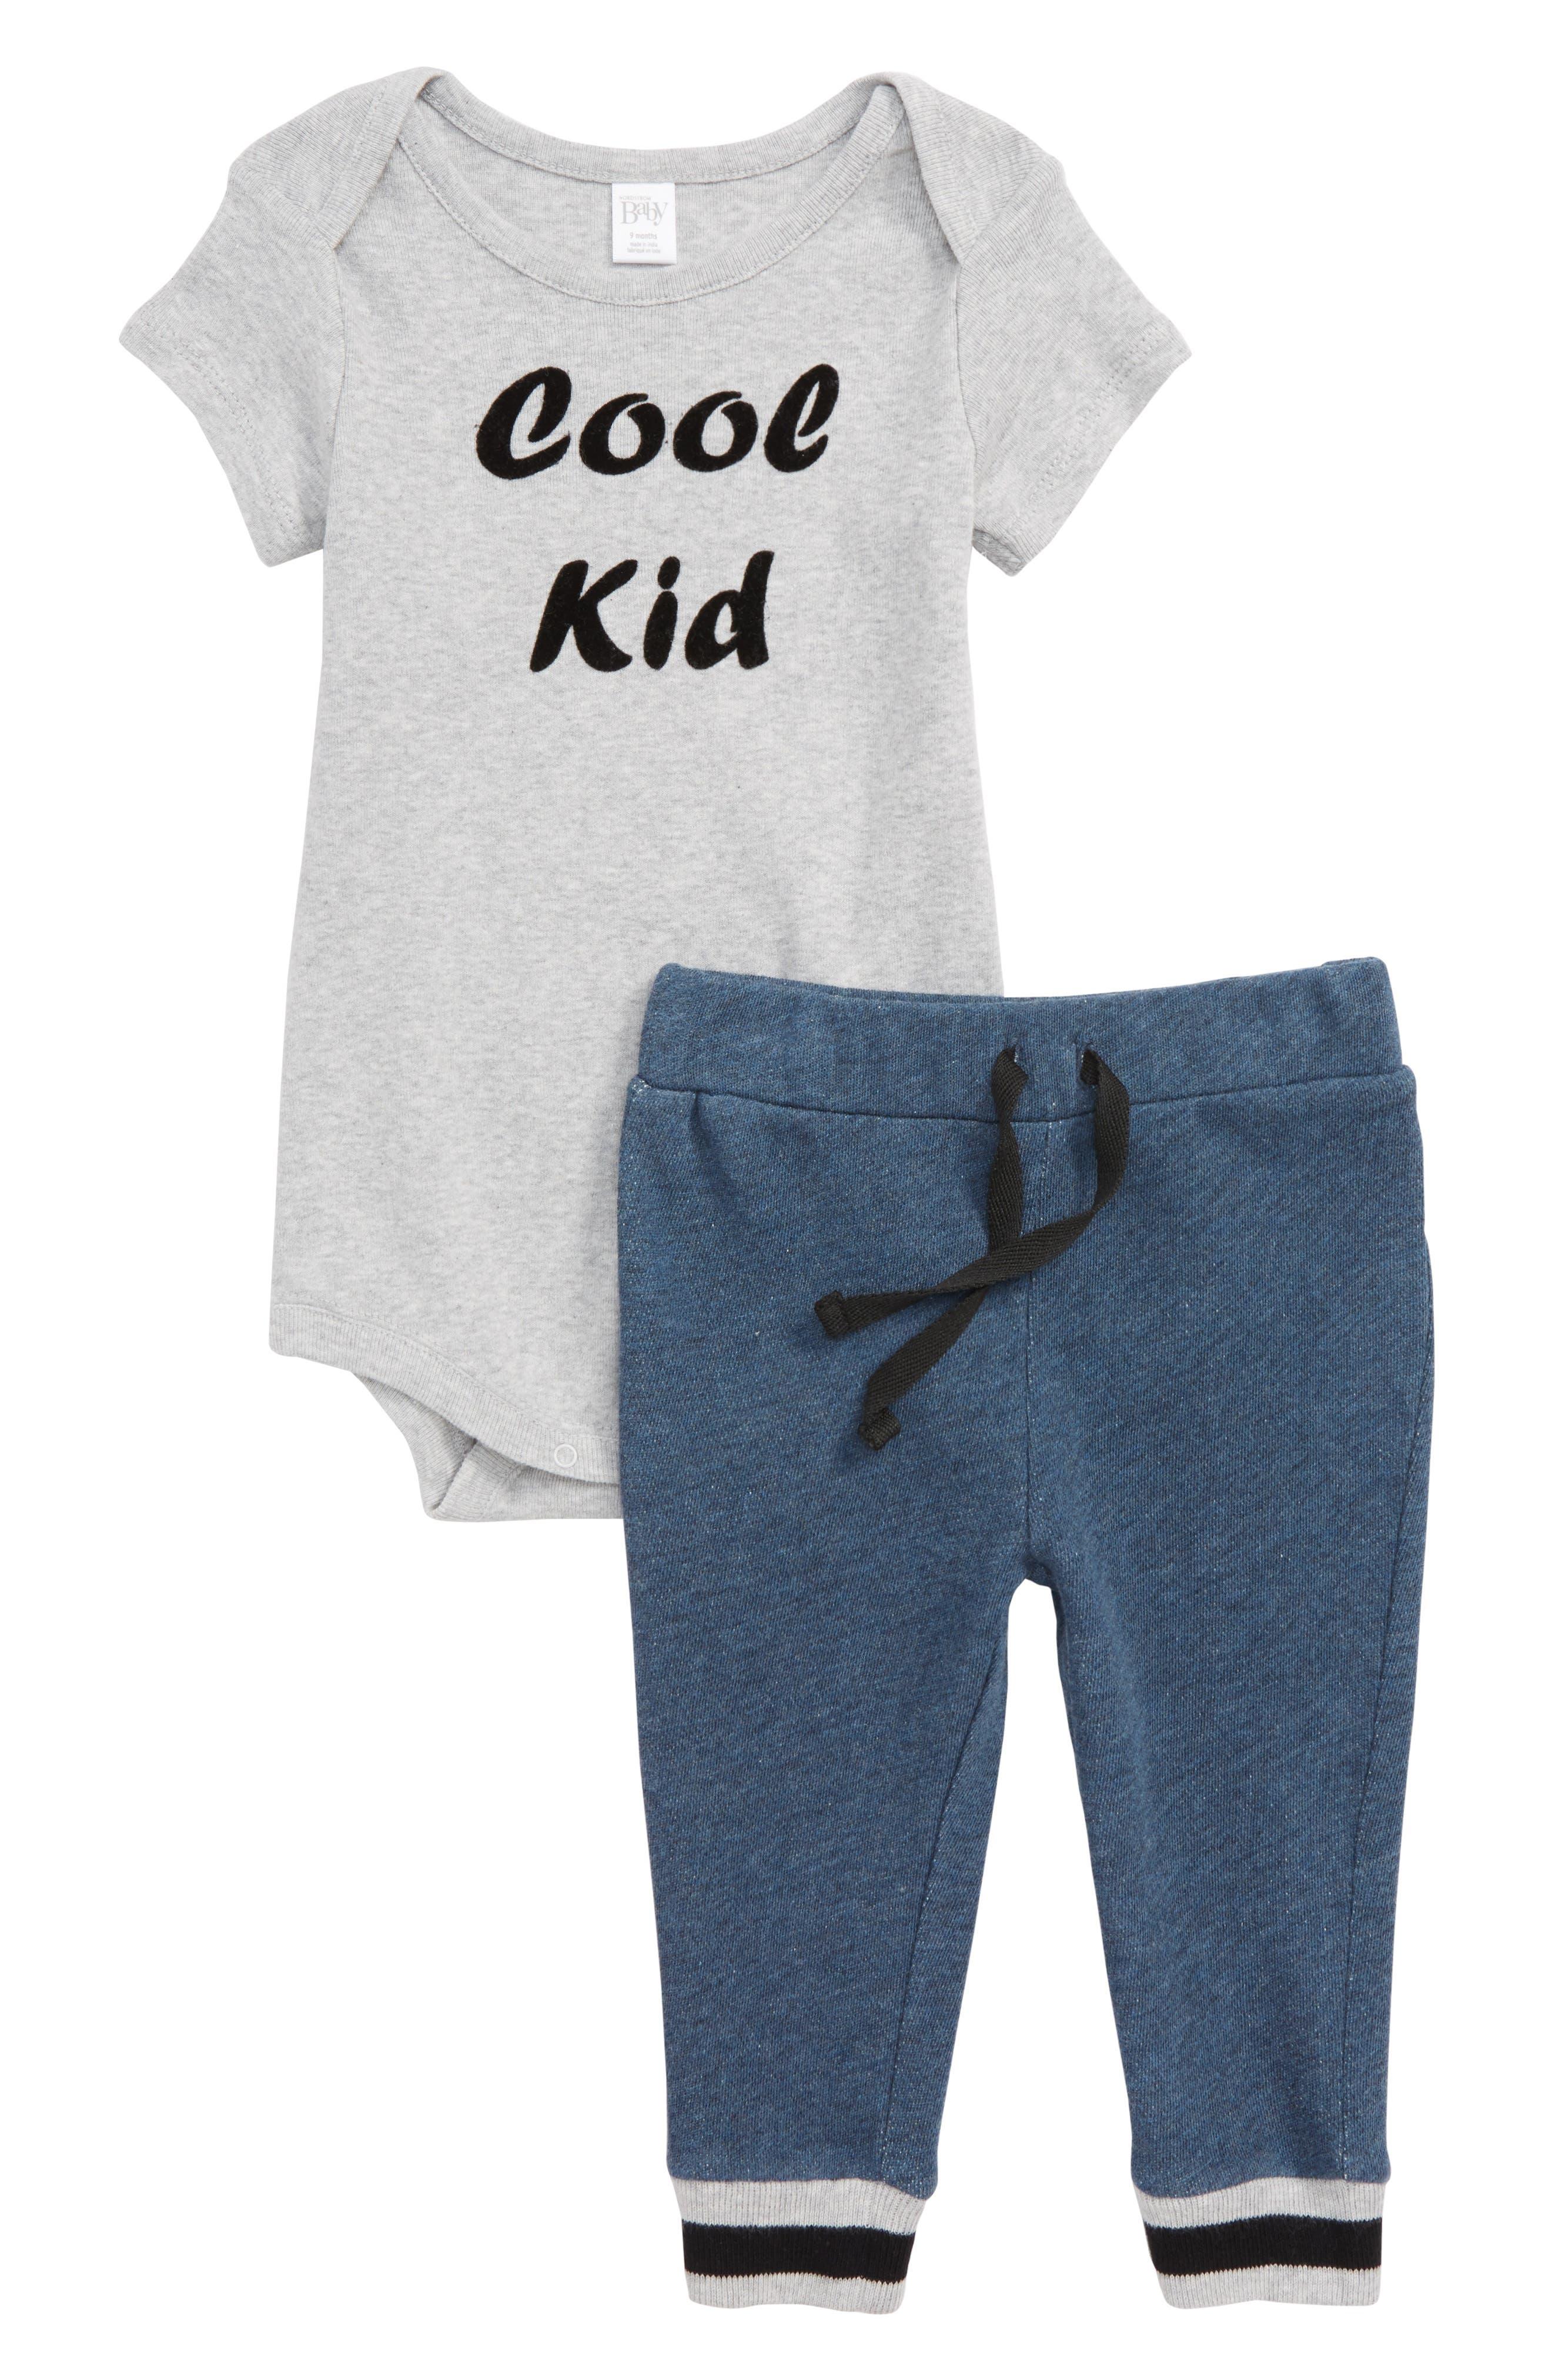 Cool Kid Bodysuit & Sweatpants Set,                             Main thumbnail 1, color,                             GREY ASH HEATHER COOL KID